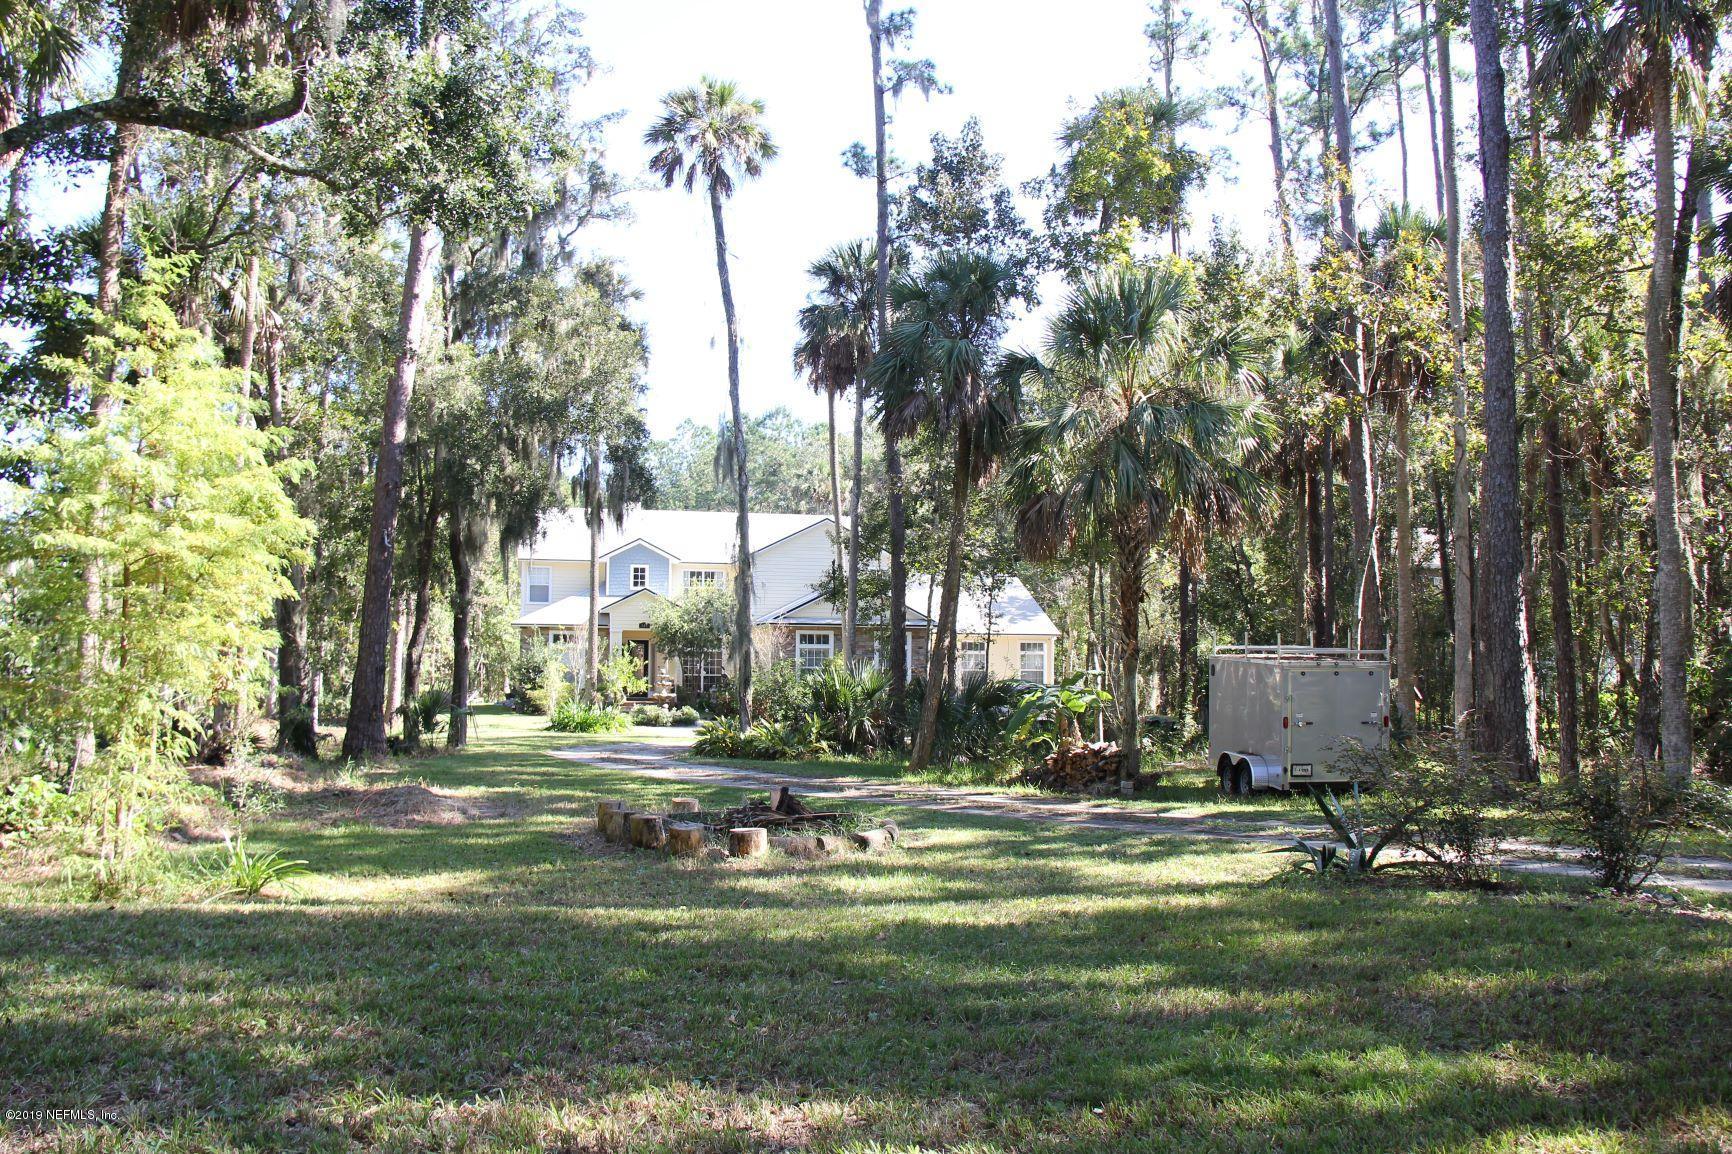 140 ROSCOE, PONTE VEDRA BEACH, FLORIDA 32082, 6 Bedrooms Bedrooms, ,4 BathroomsBathrooms,Residential - single family,For sale,ROSCOE,967653